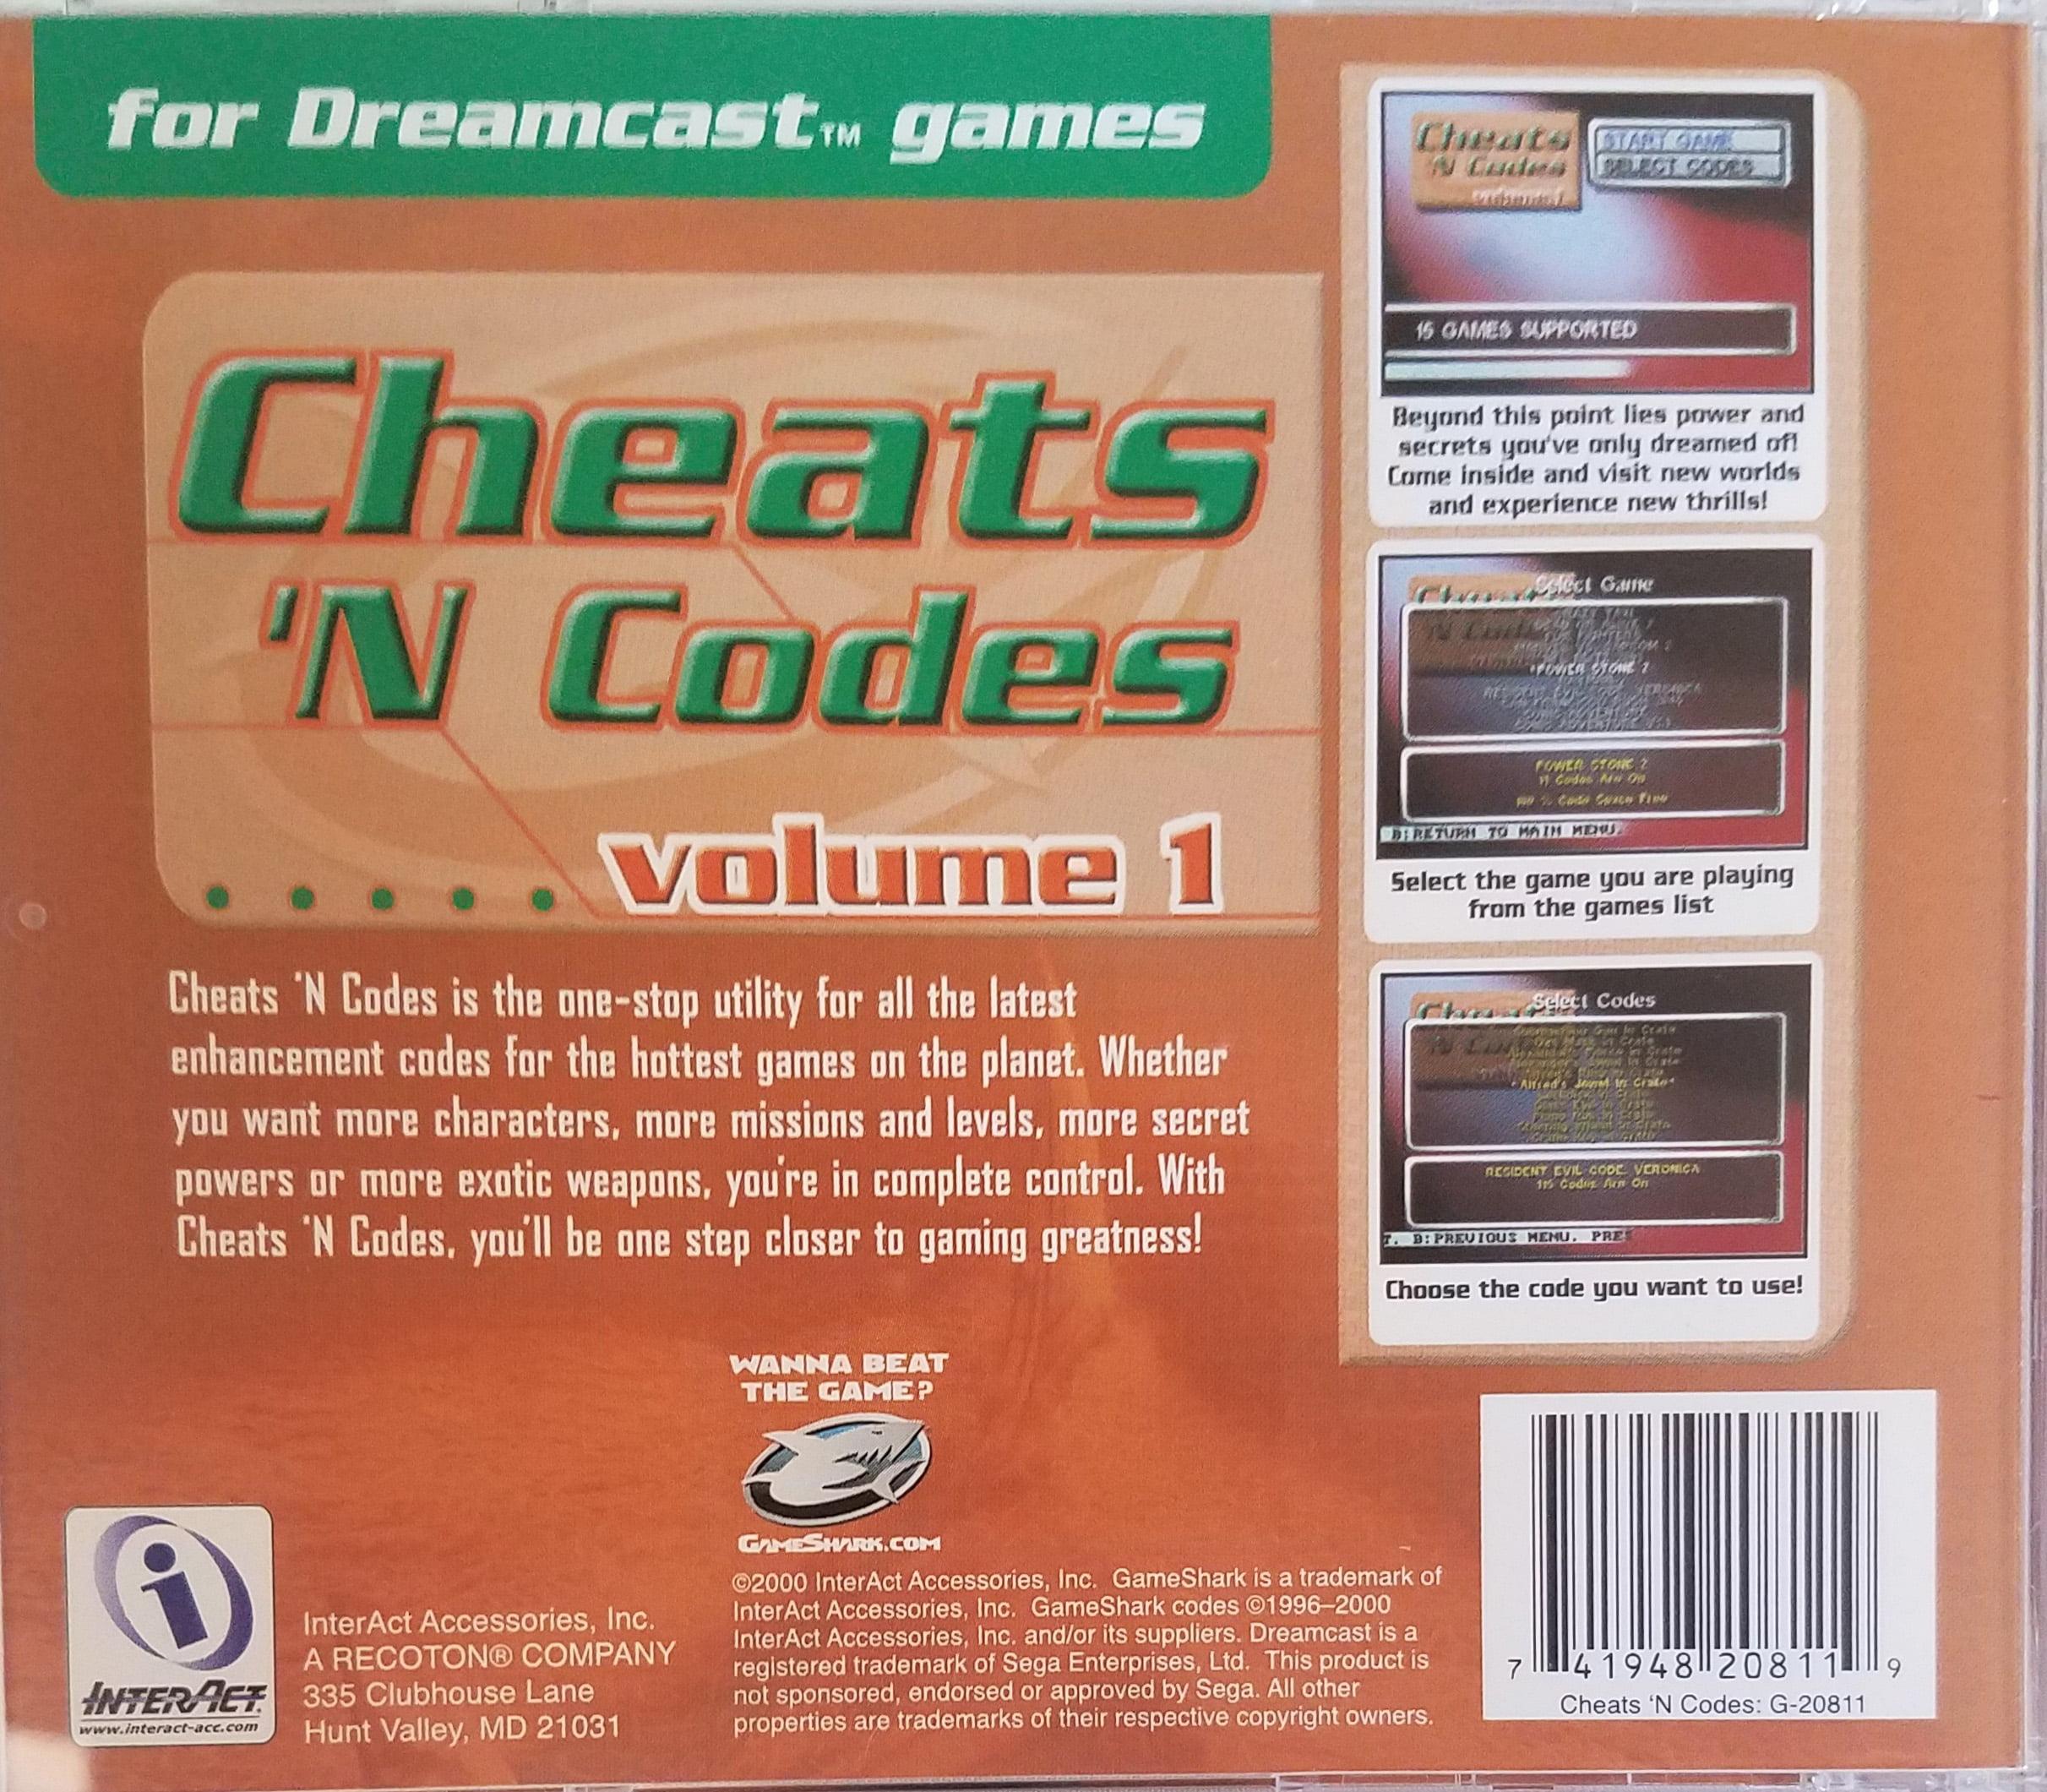 GameShark Cheats 'N Codes Volume 1 for Sega Dreamcast Games / Boot Disc  Import Enabler for European and Japanese Games